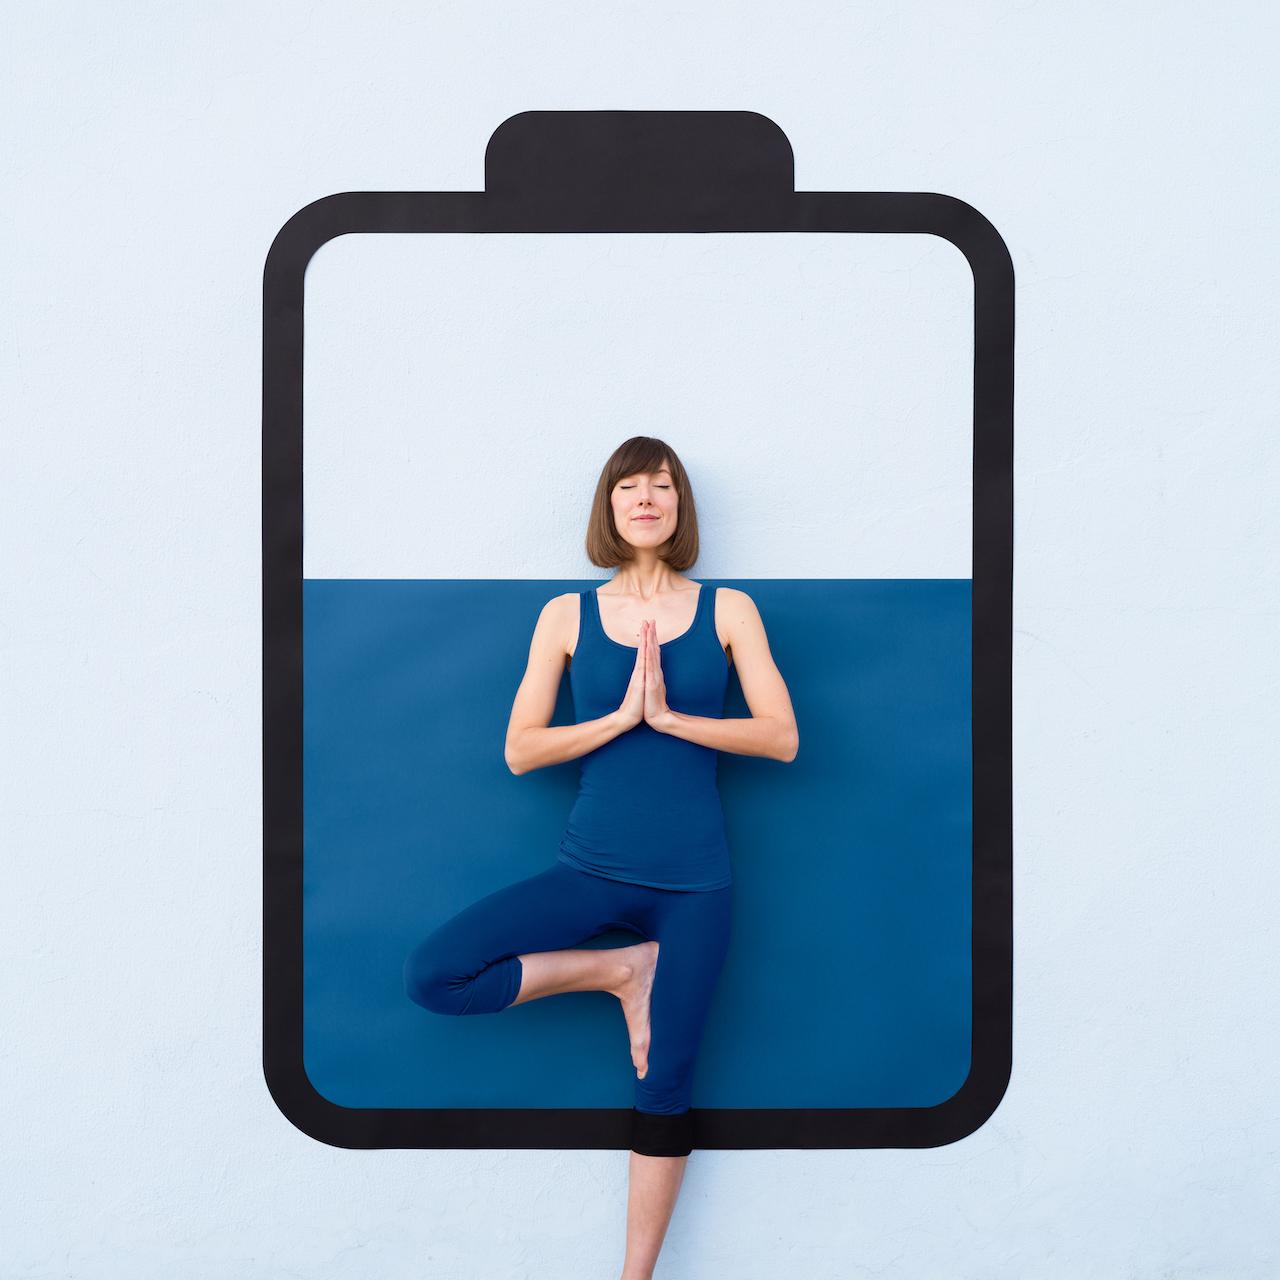 Annandaniel Anna Devís Daniel Rueda Anniset DrCuerda Artist Creative Minimal Photography Paper Art Battery Yoga Pose Meditation Pantone Adobe Color of the year Classic blue 2020